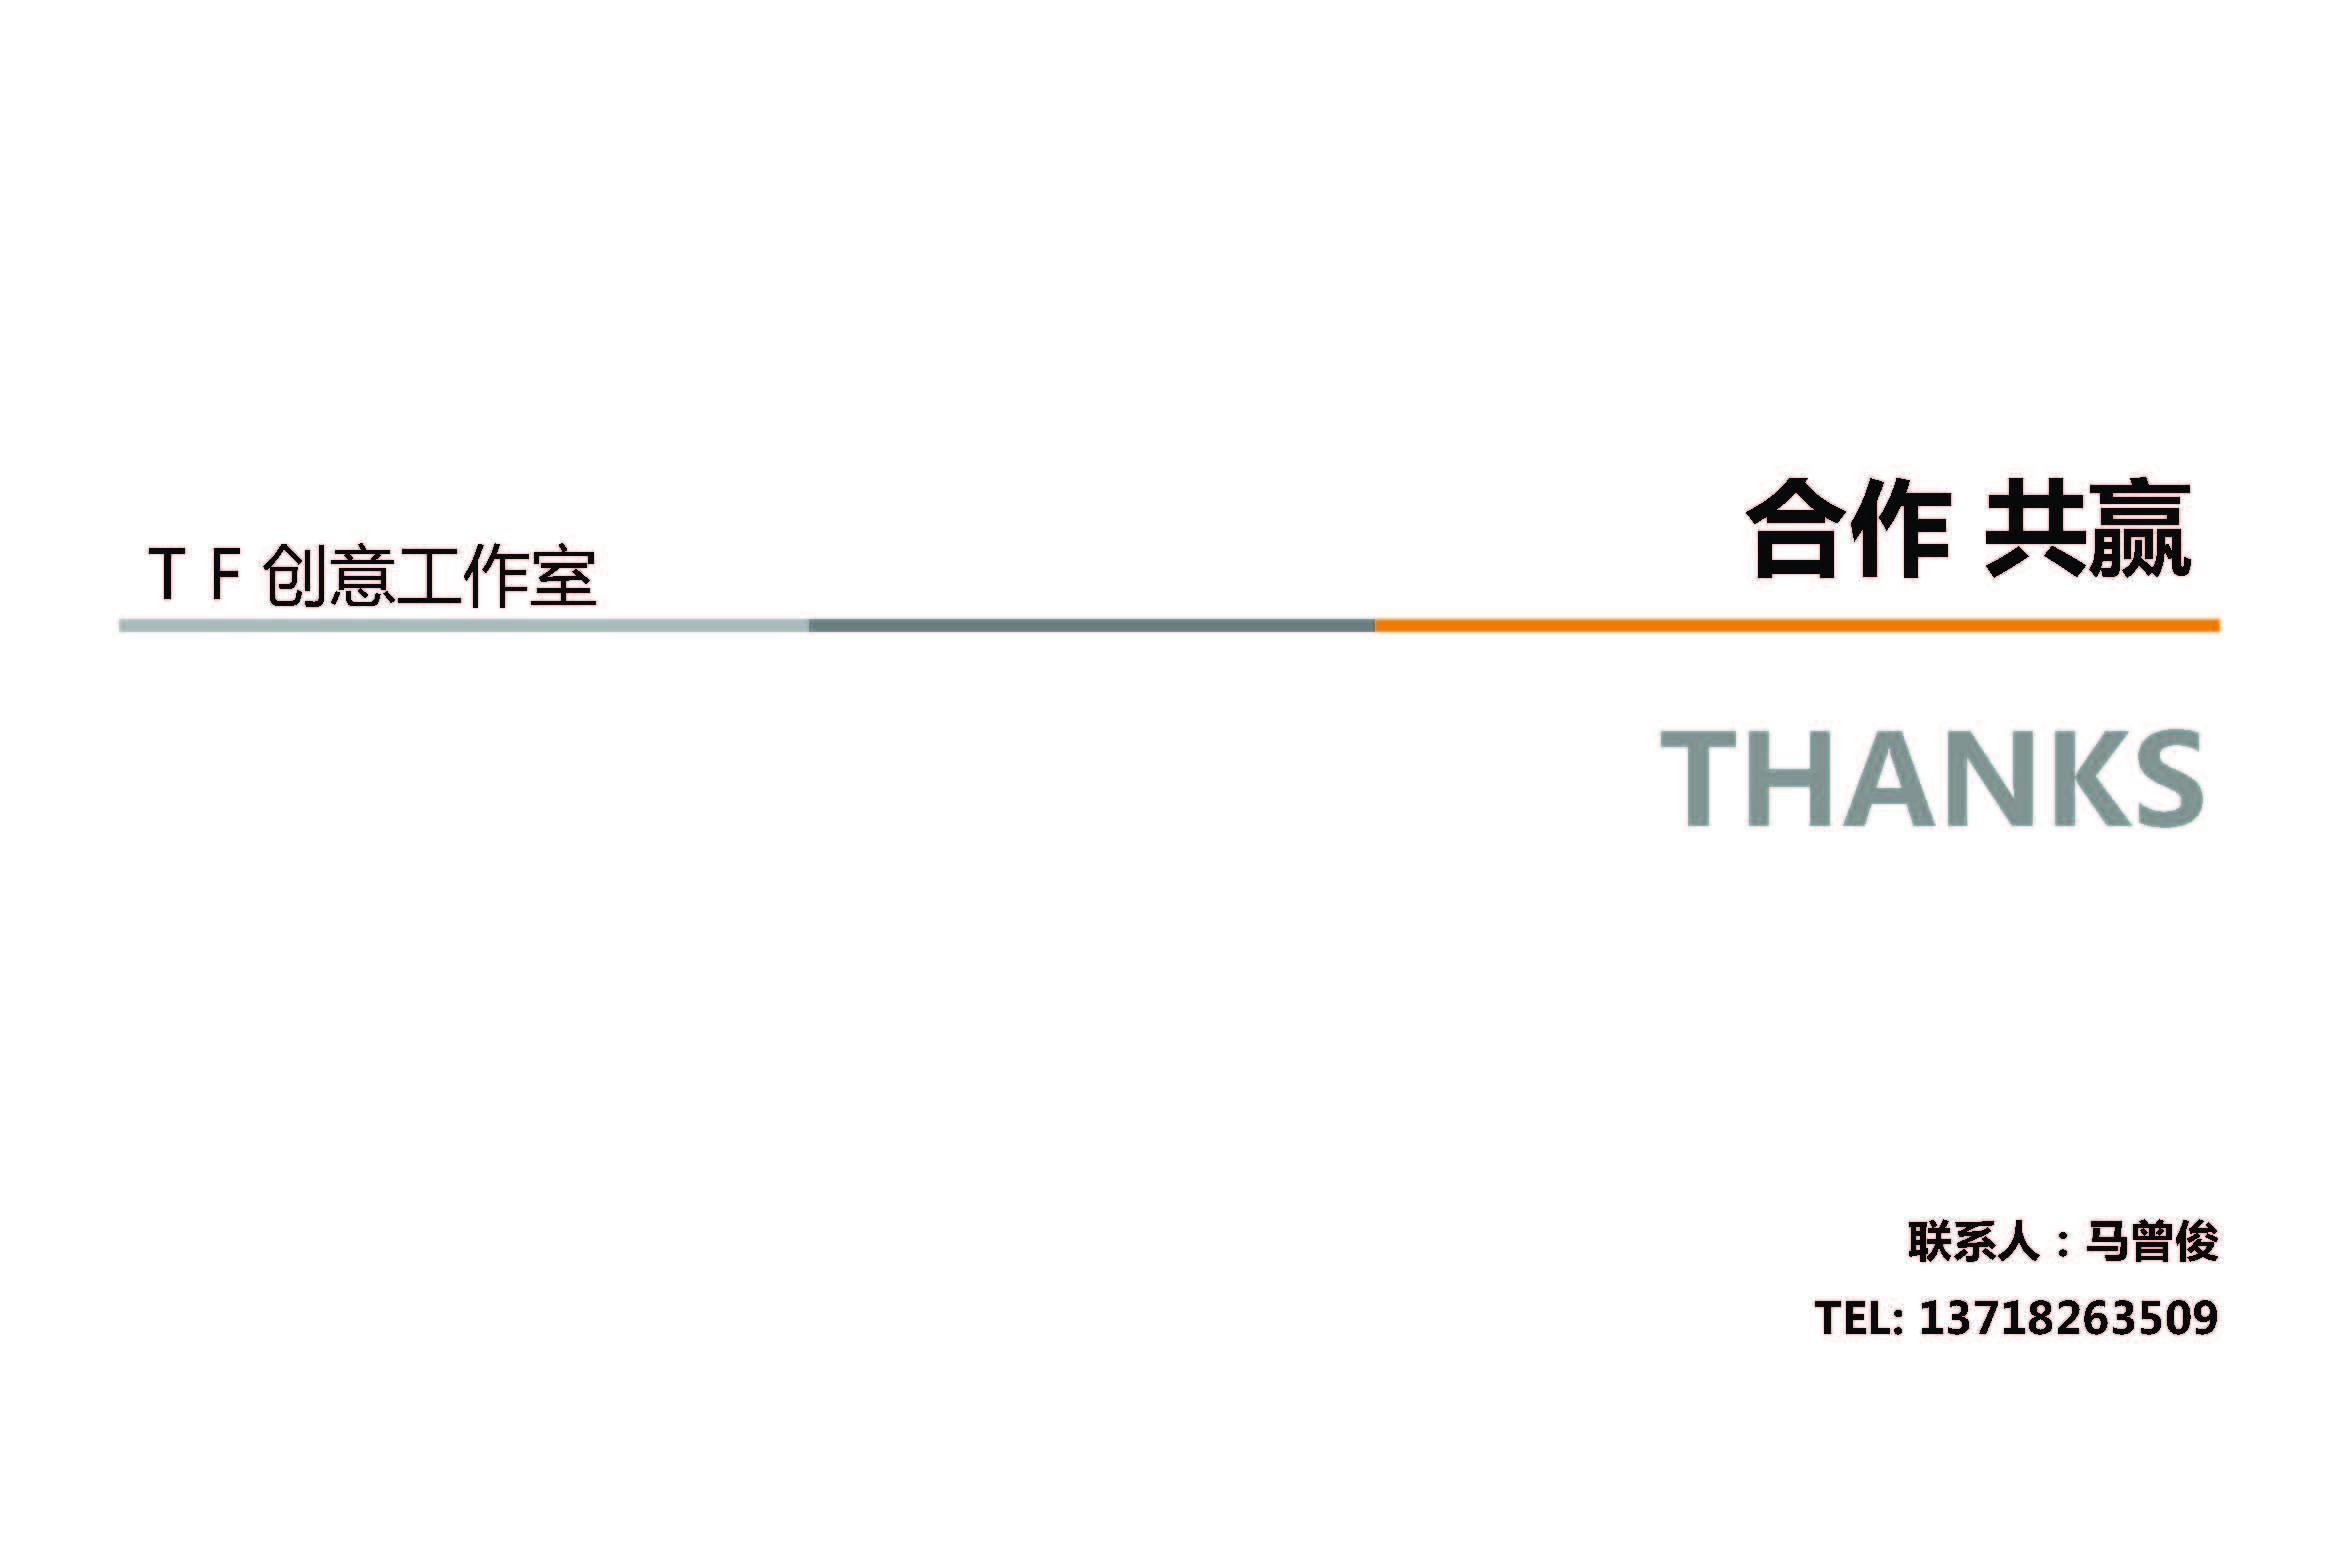 TF创意工作室简介_页面_21.jpg